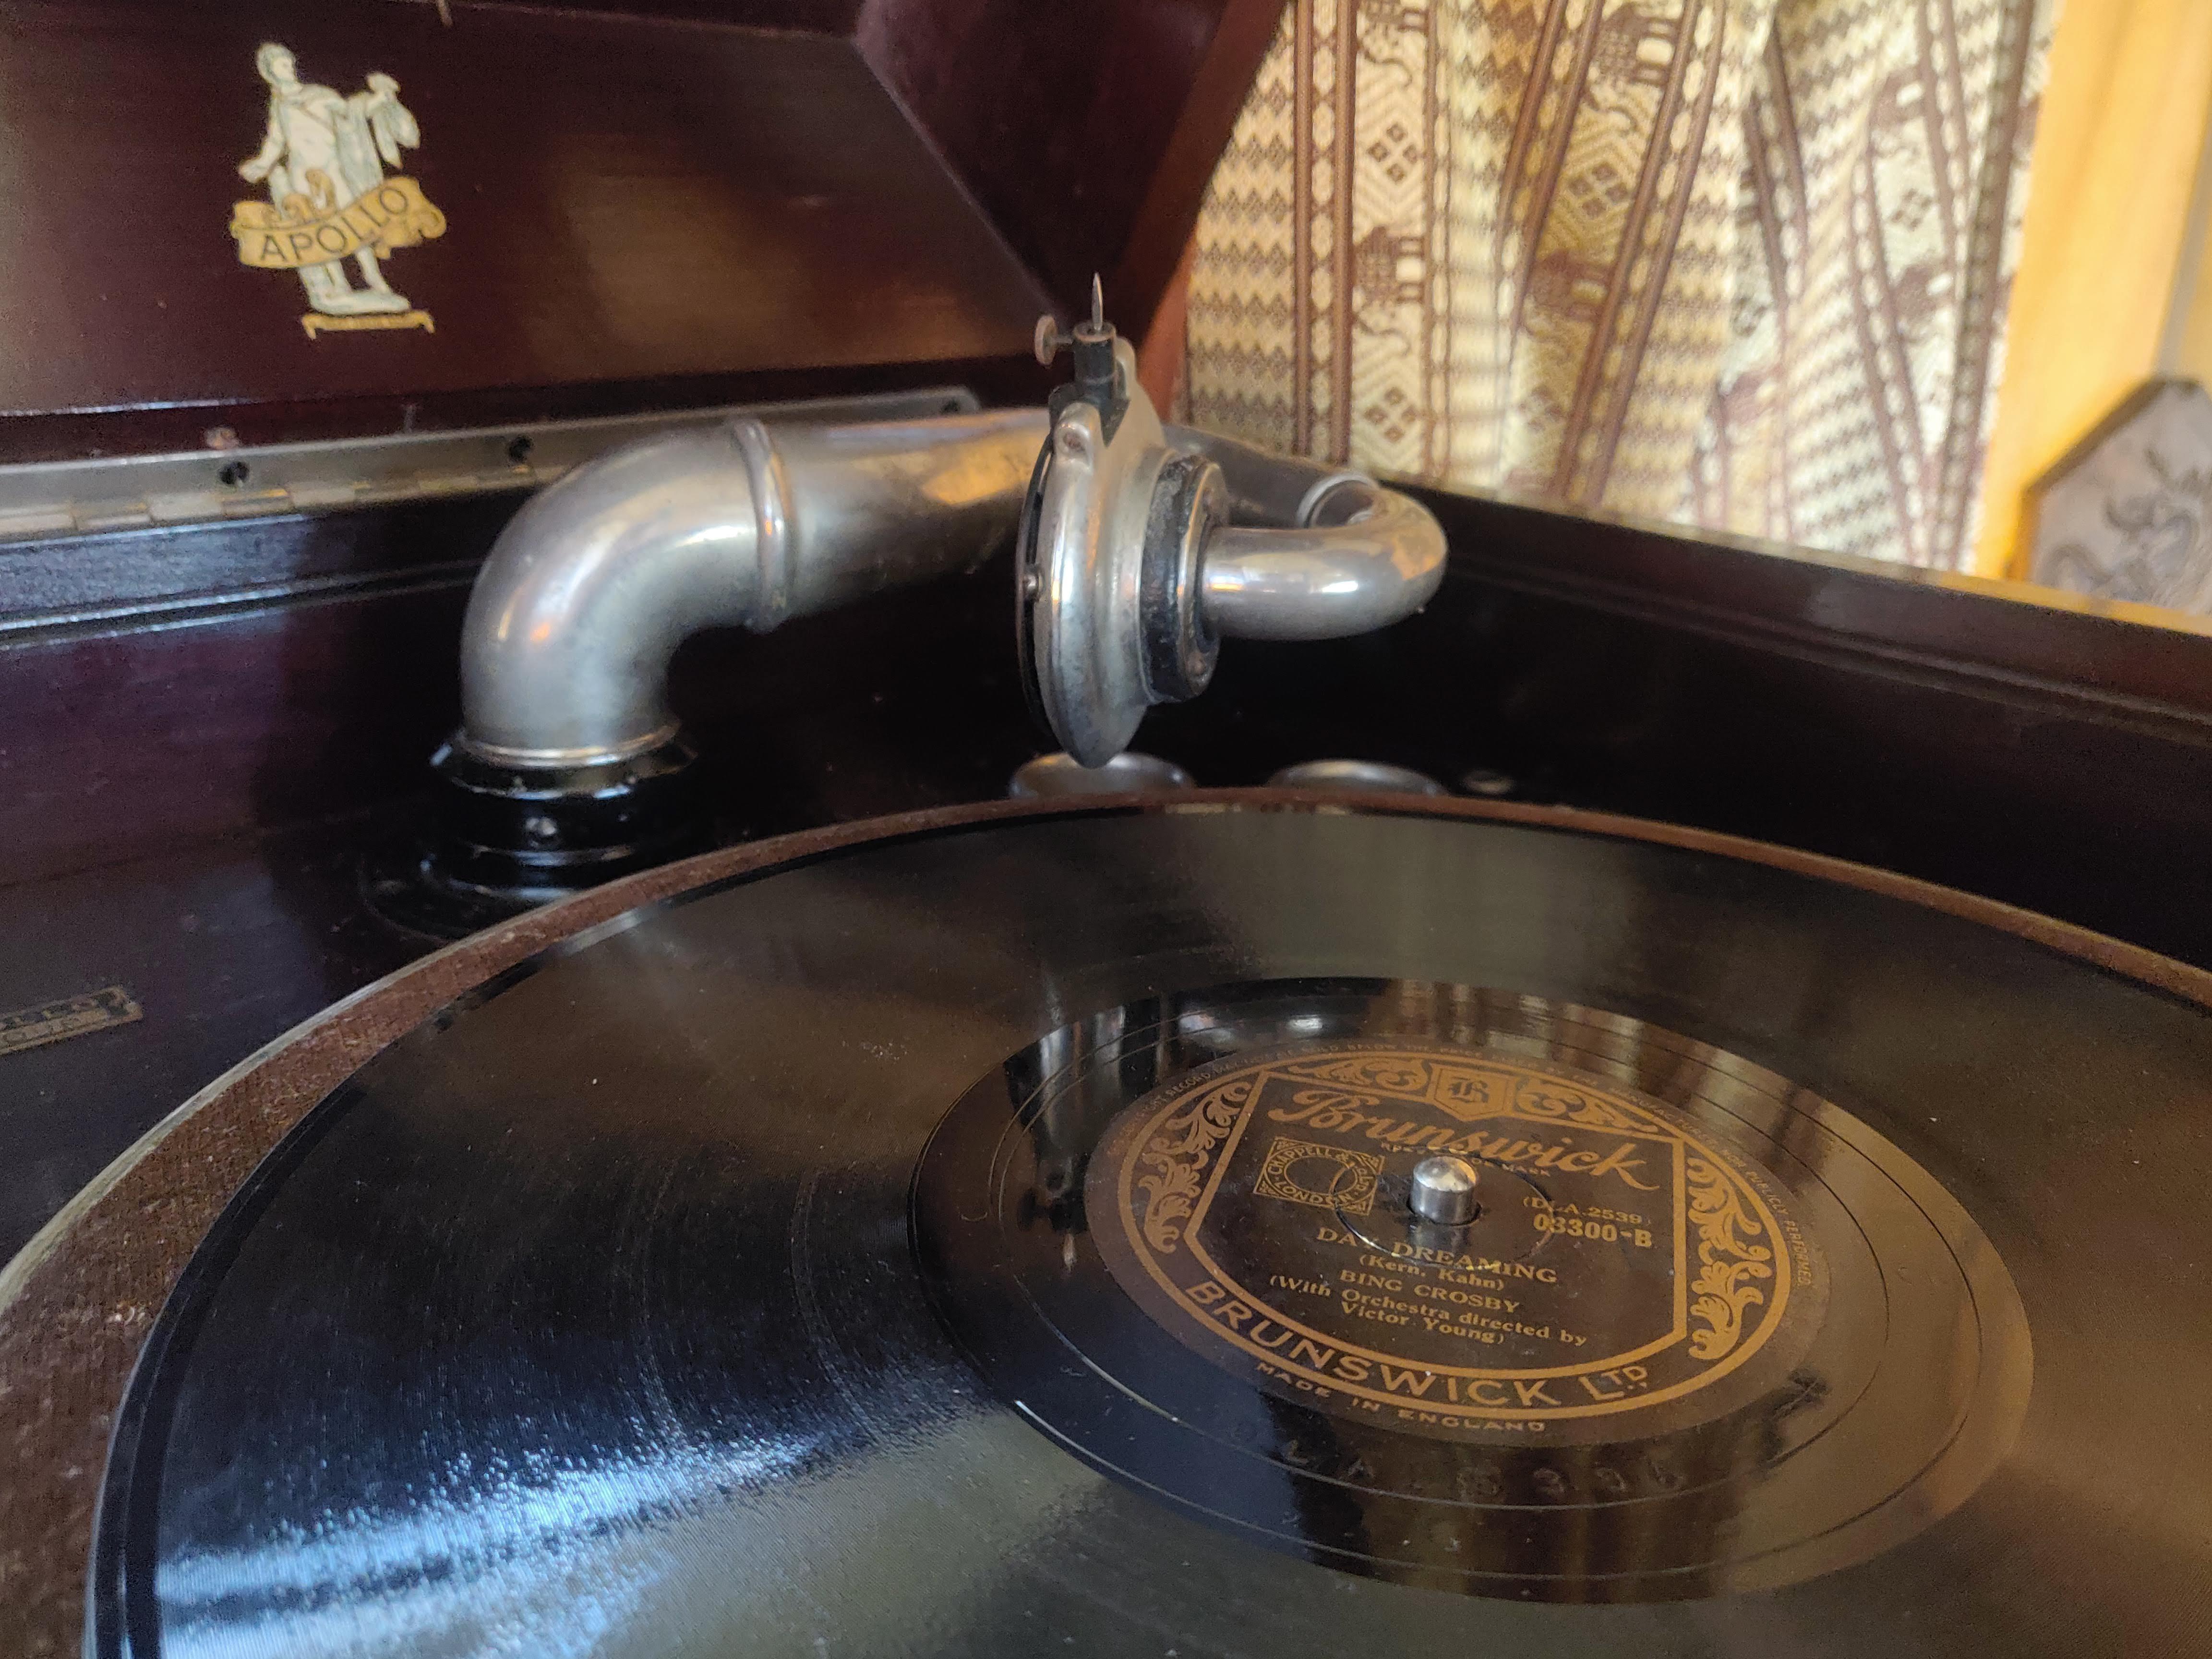 The gramophone in Northern Skies